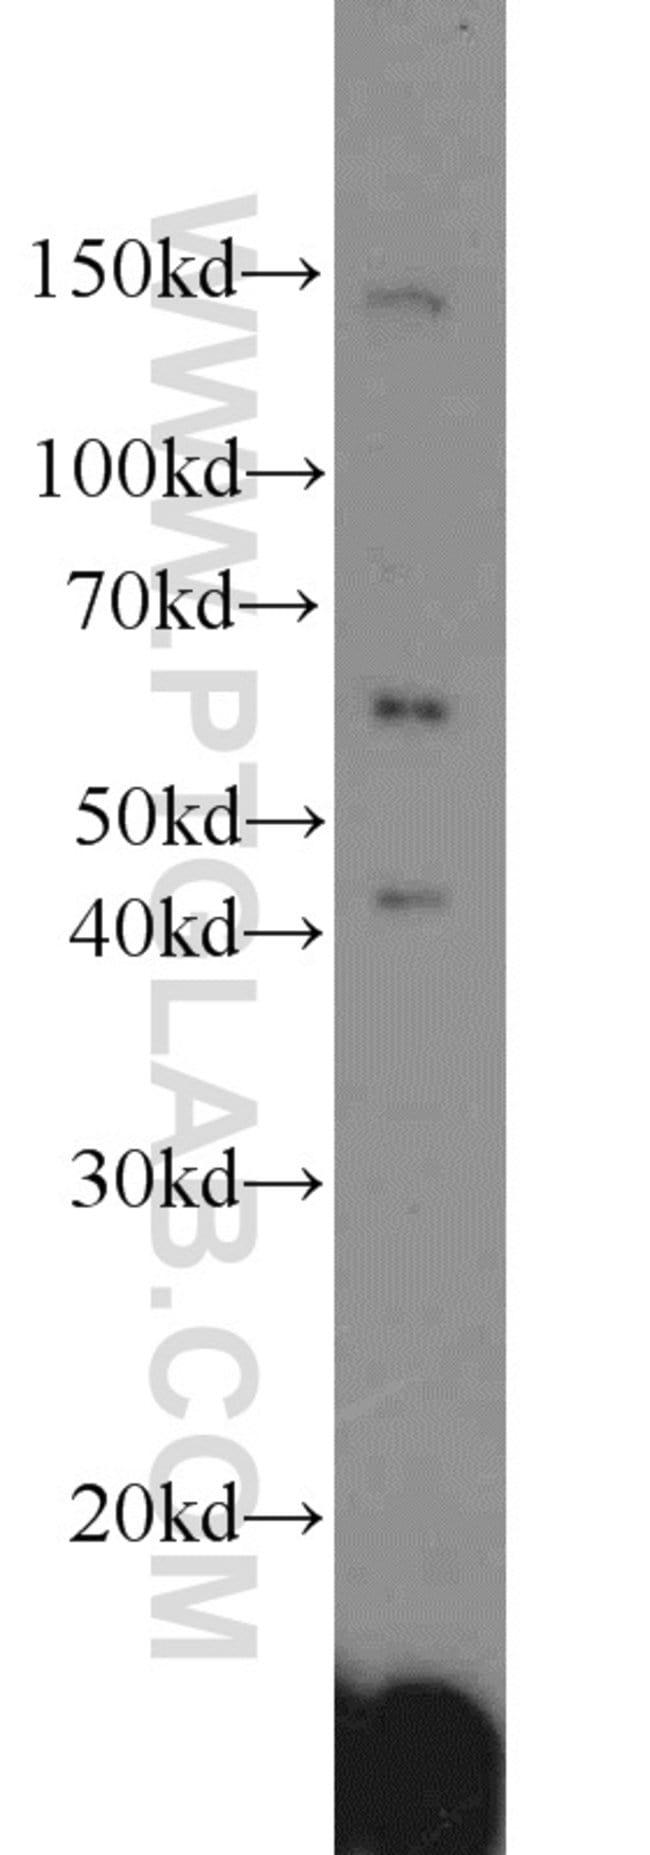 ACP2 Rabbit anti-Human, Mouse, Rat, Polyclonal, Proteintech 150 μL; Unconjugated Produkte